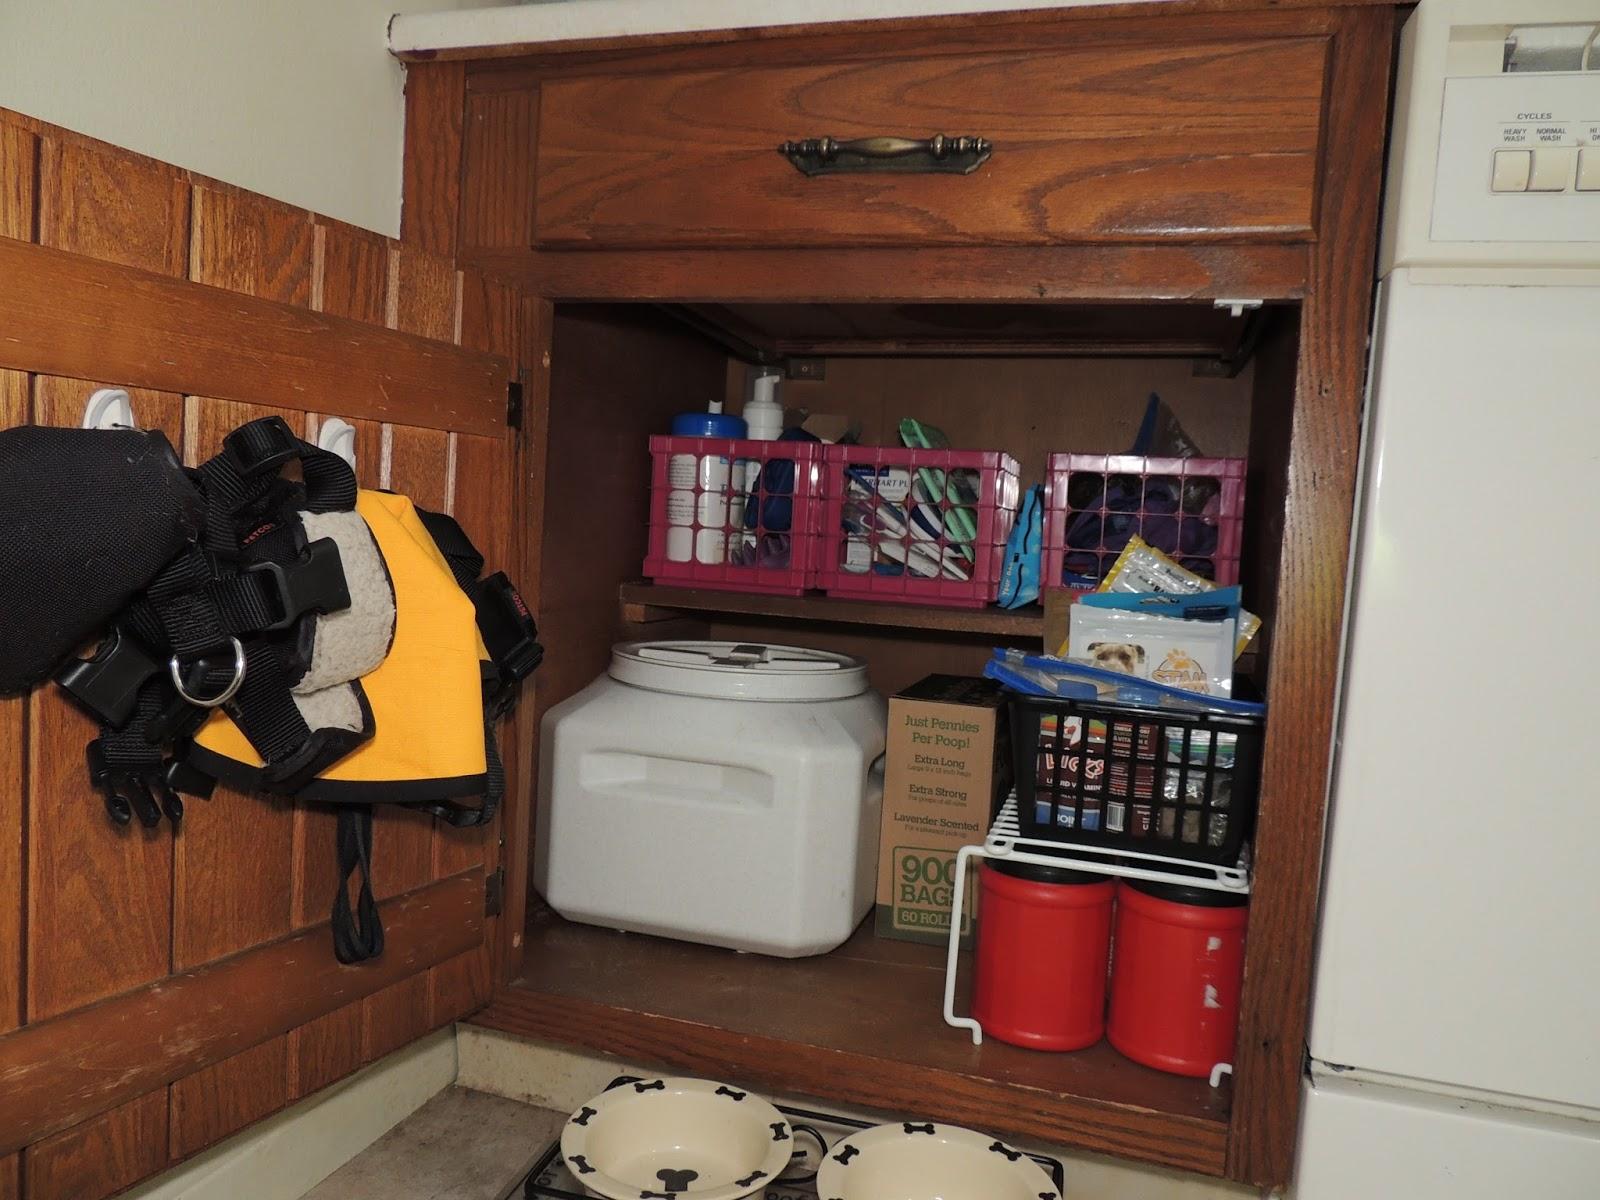 Erie Sisti Bull Organizing Dog Gear Dog Cabinet And Leashes